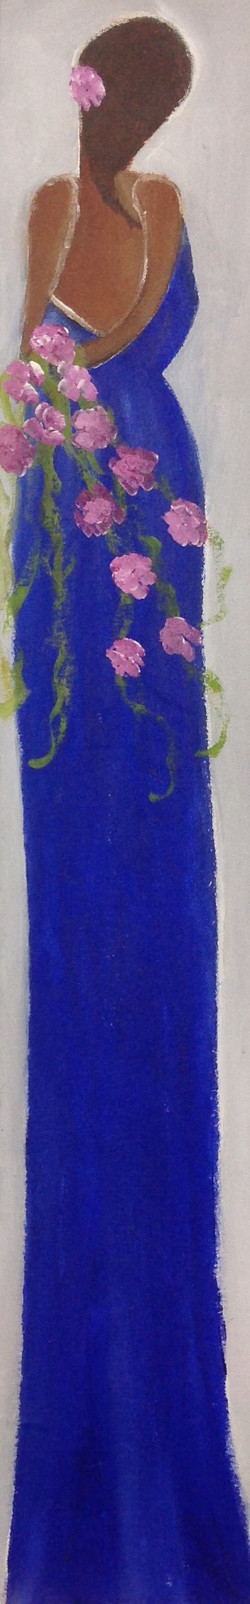 Rigaud Joseph Elie 42X7 #17-1-12 canvas